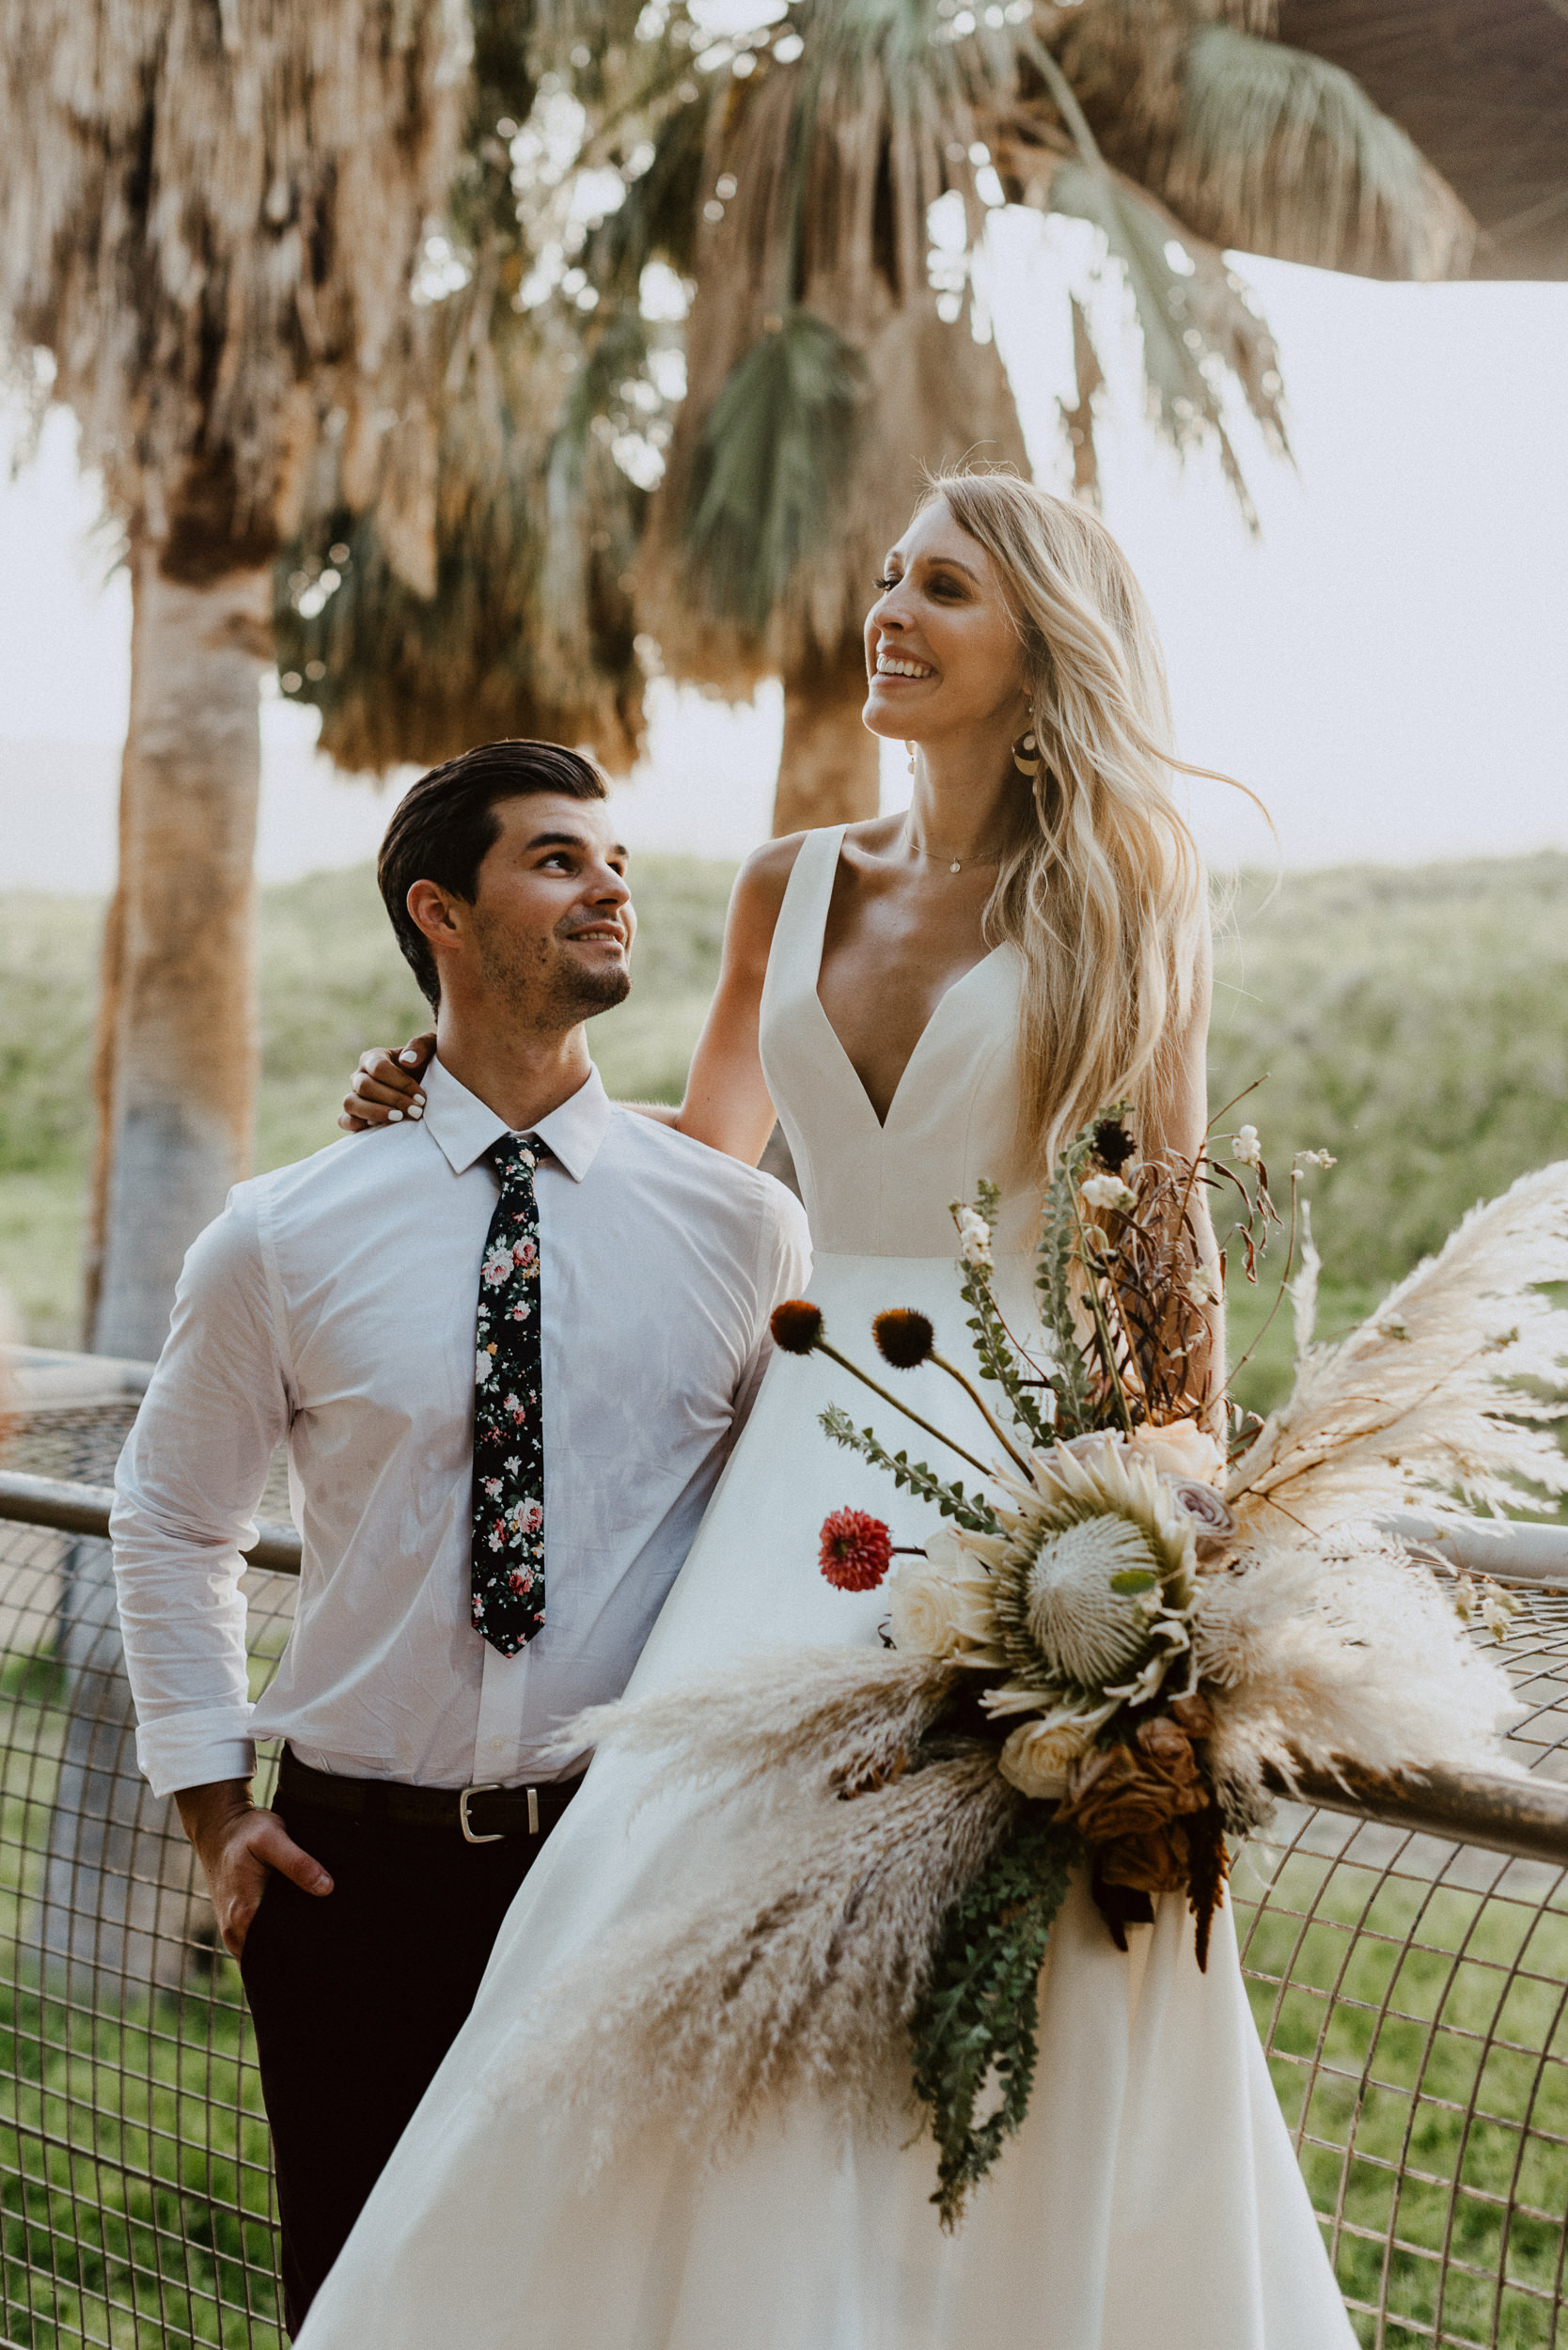 sChelsie + Chris - The Desert Shootout Wedding Romantics at The Living Desert-169.jpg